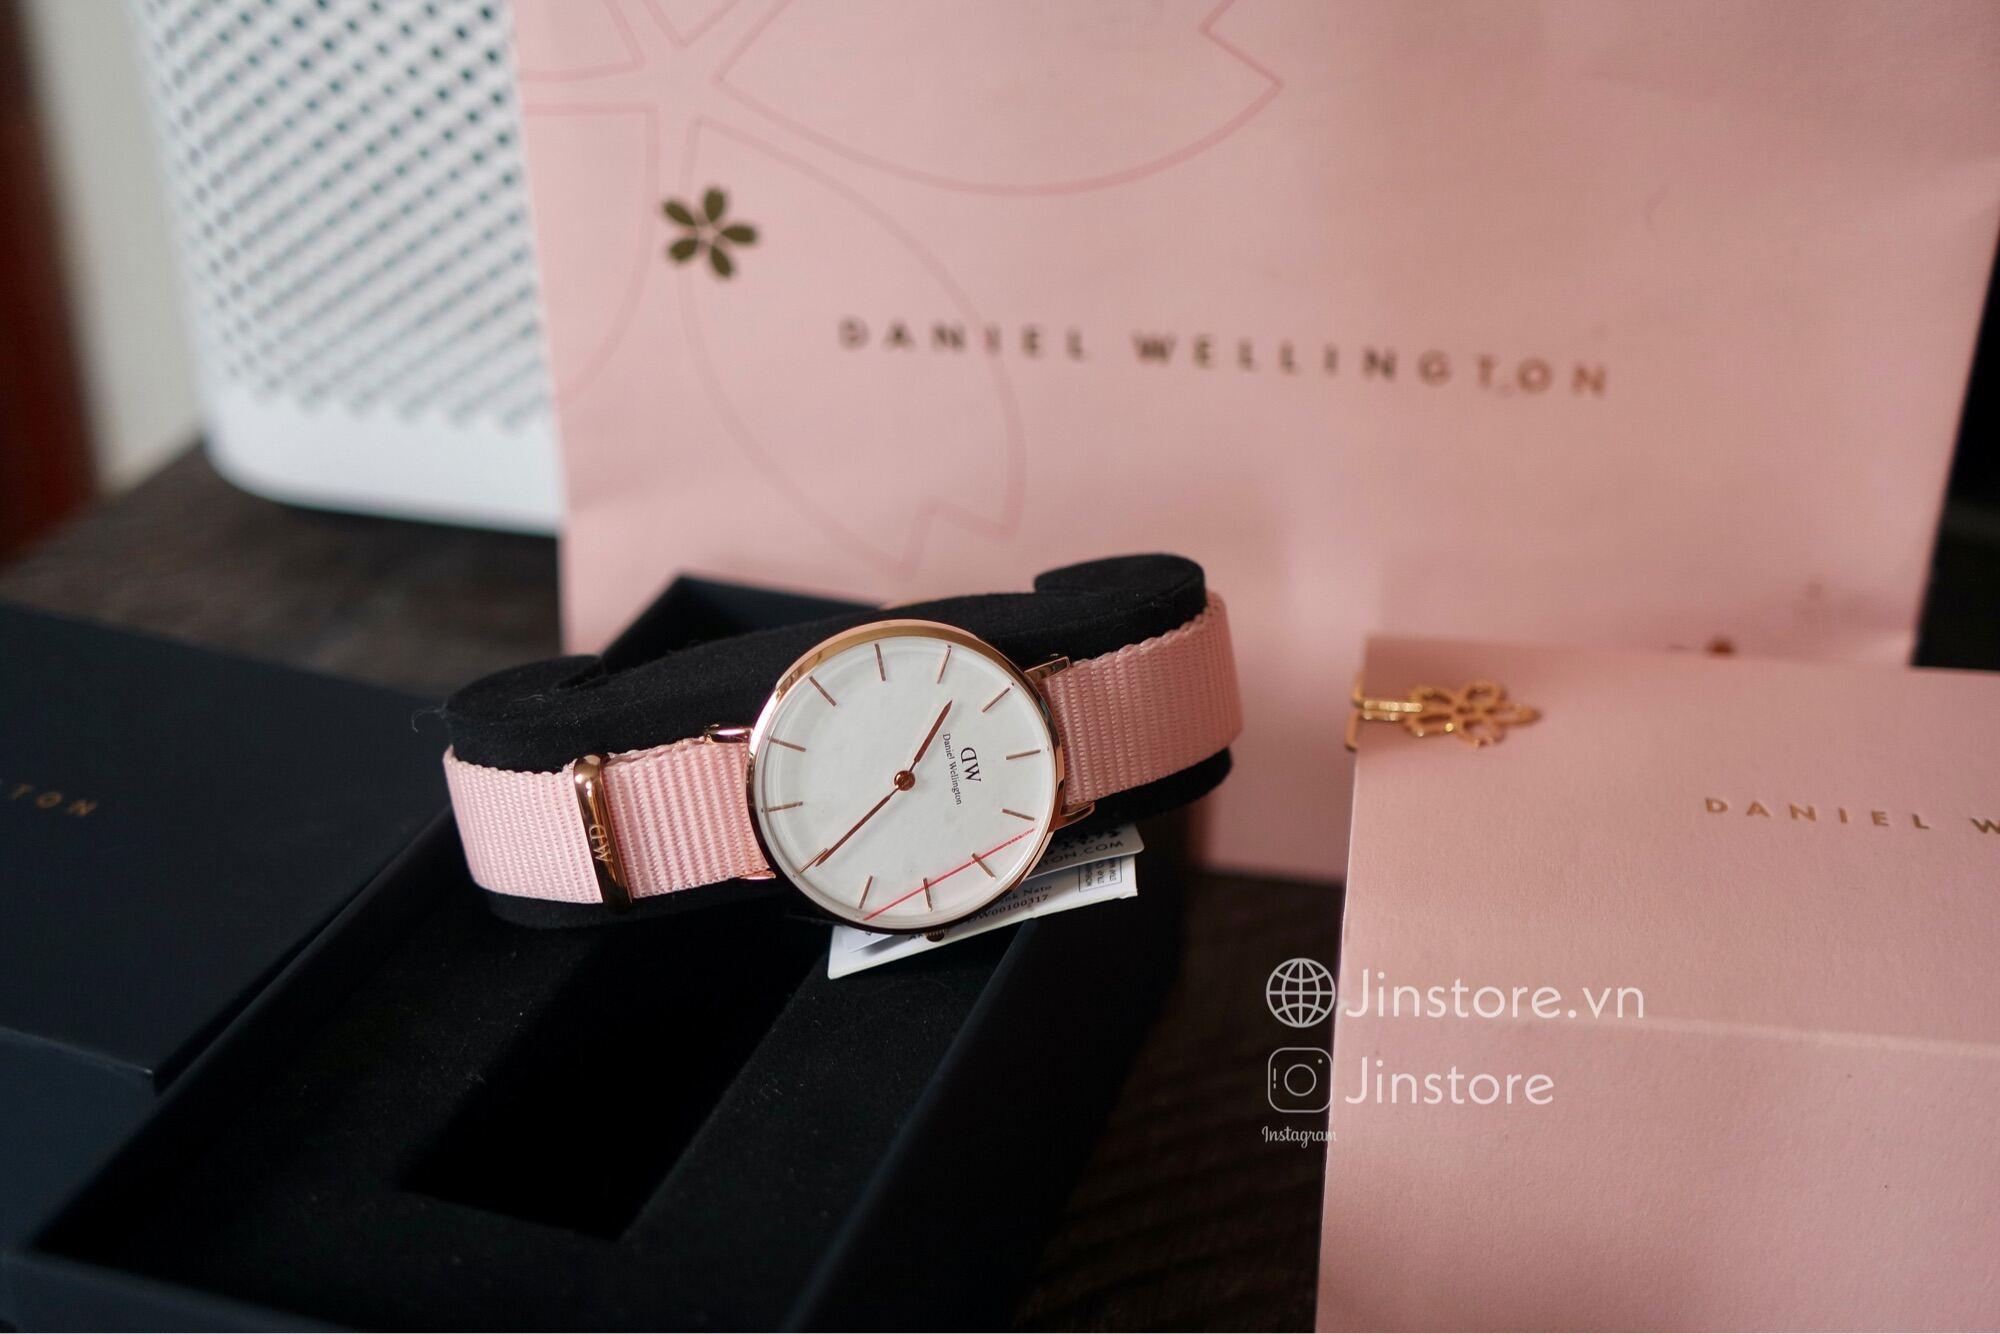 Đồng hồ nữ DW Petite Rosewater 32 RG - DW00100317